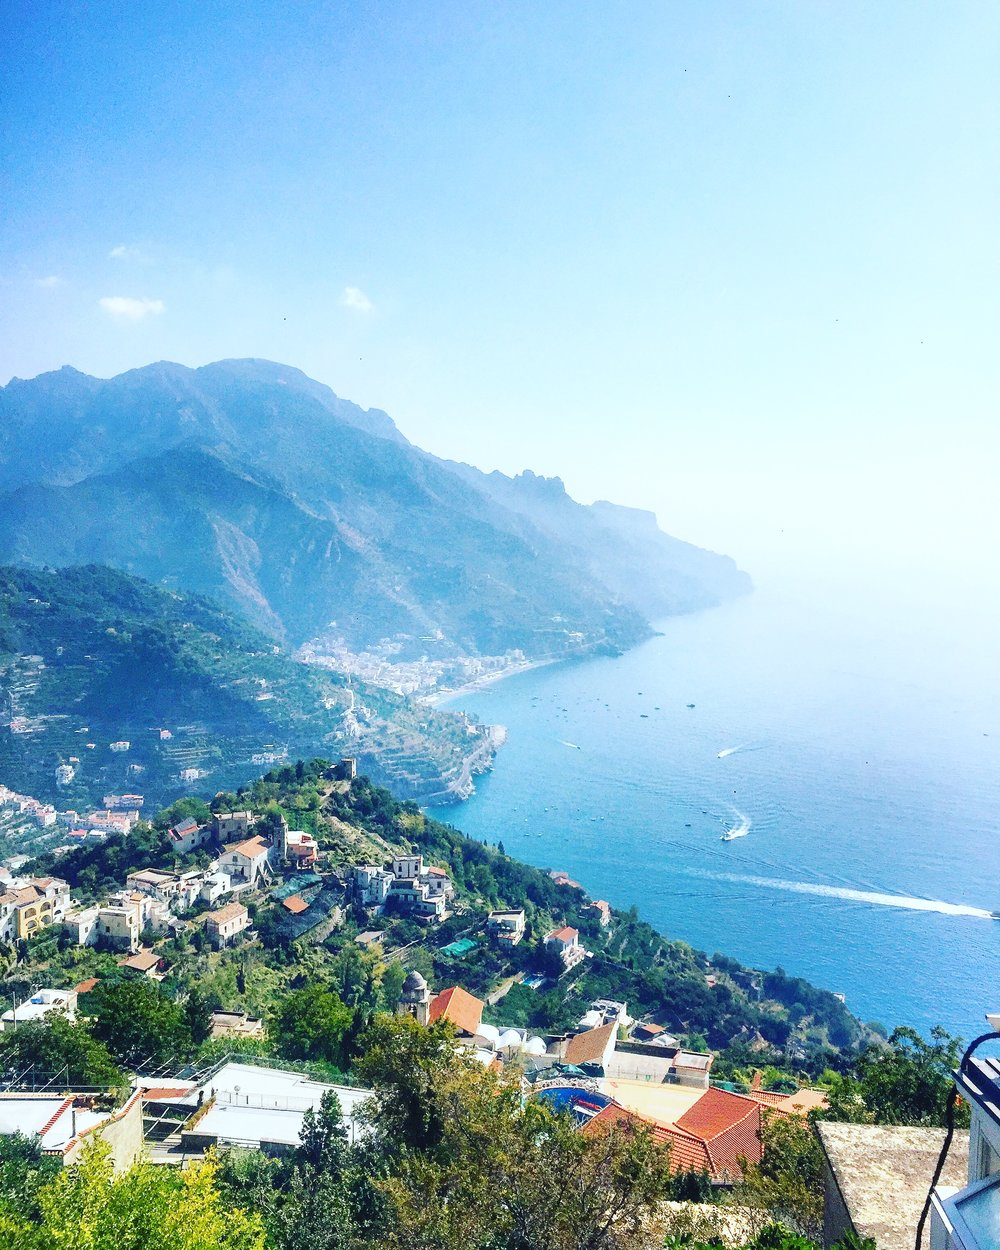 View of Amalfi Coast from Ravello, Italy